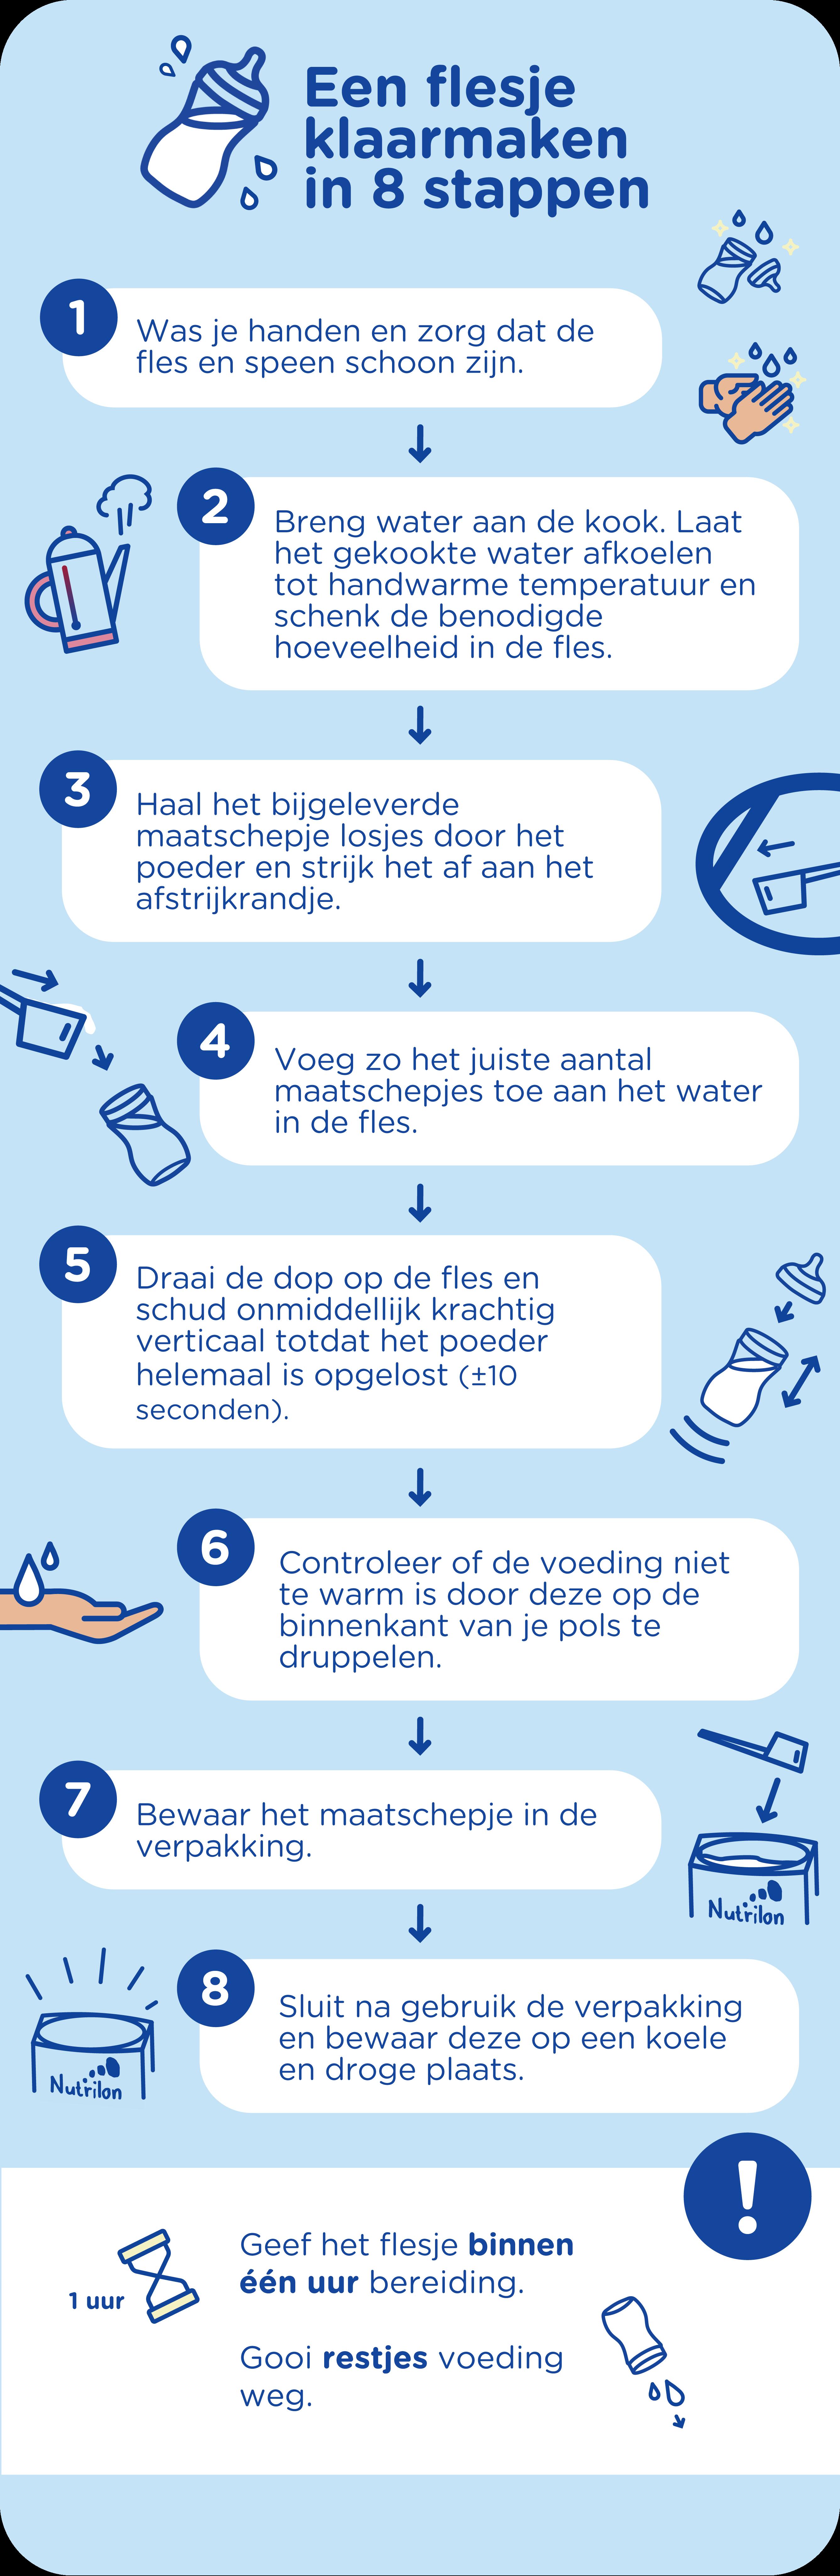 Flesvoeding maken in 8 stappen